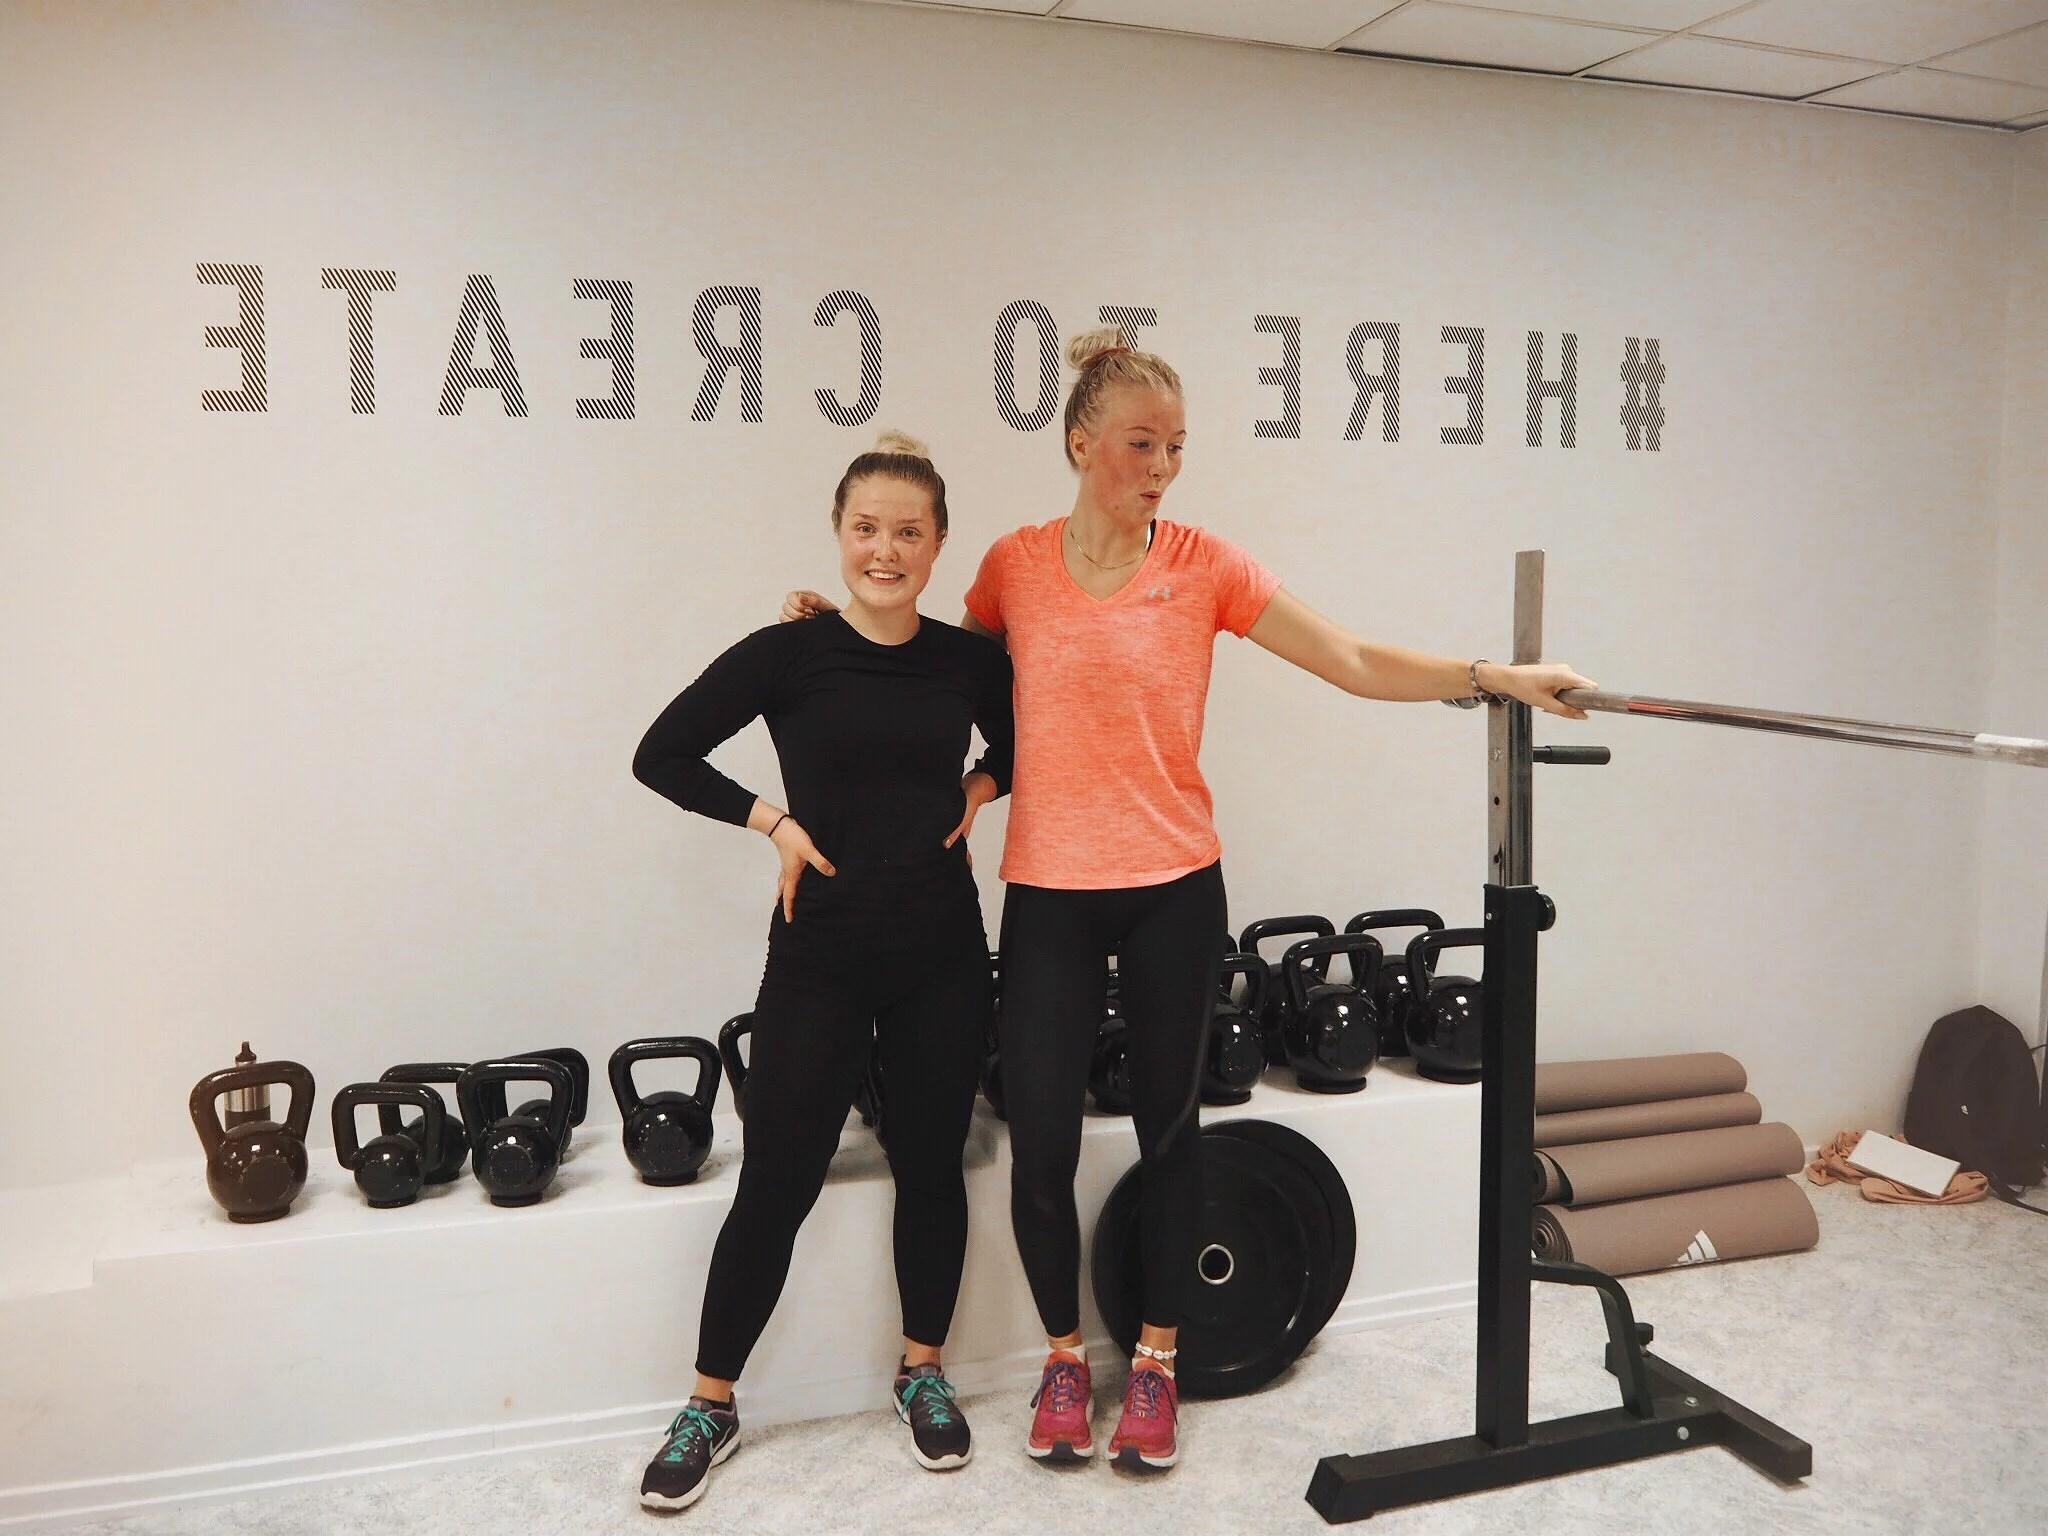 Workout w/ Adidas